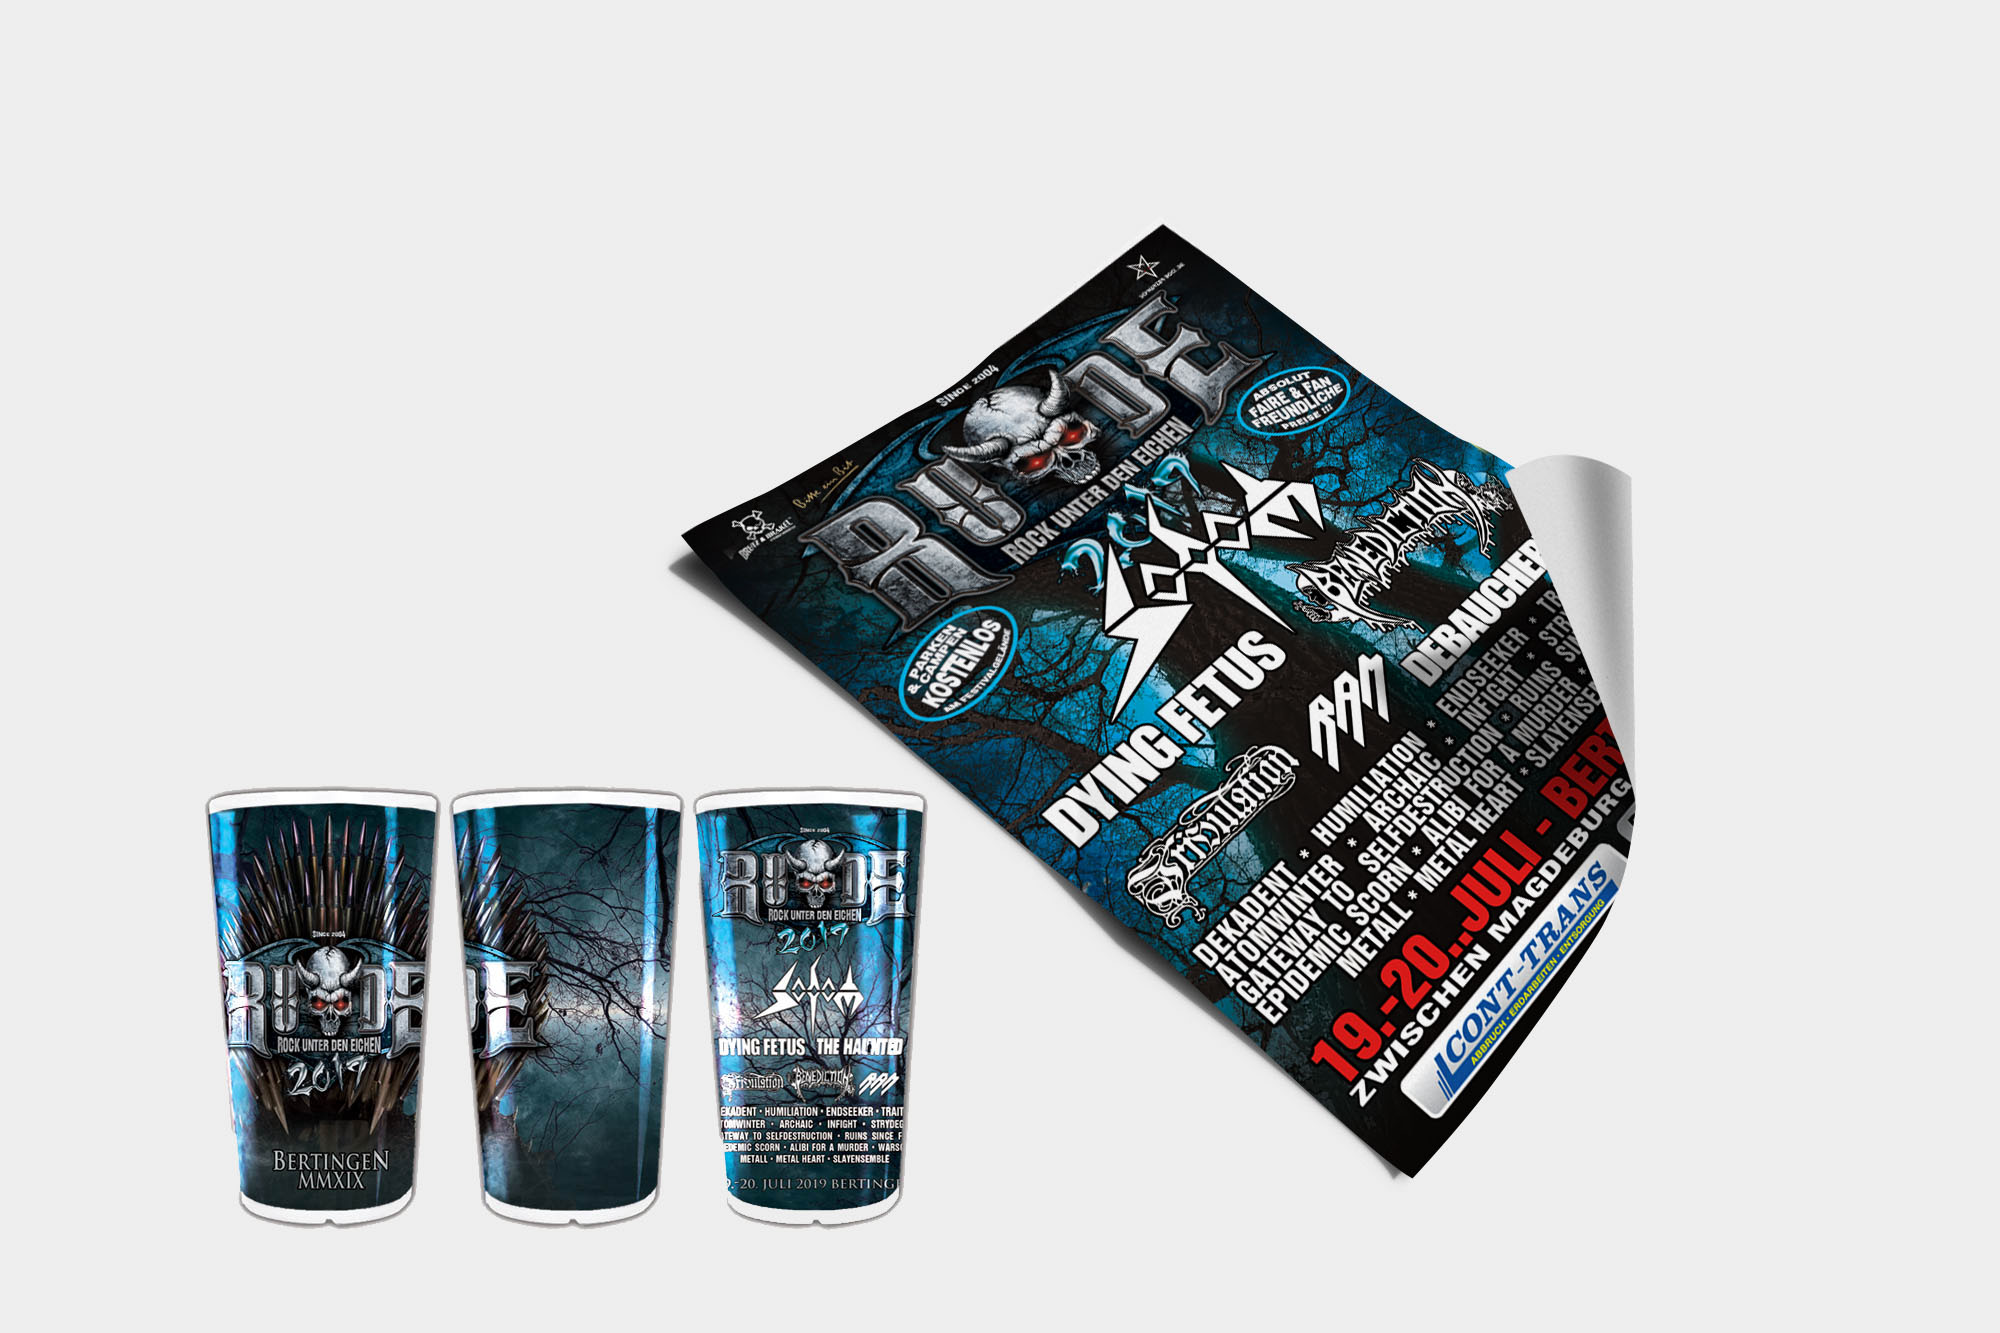 R.U.D.E. Open Air 2019 / Poster & Festival-Cups